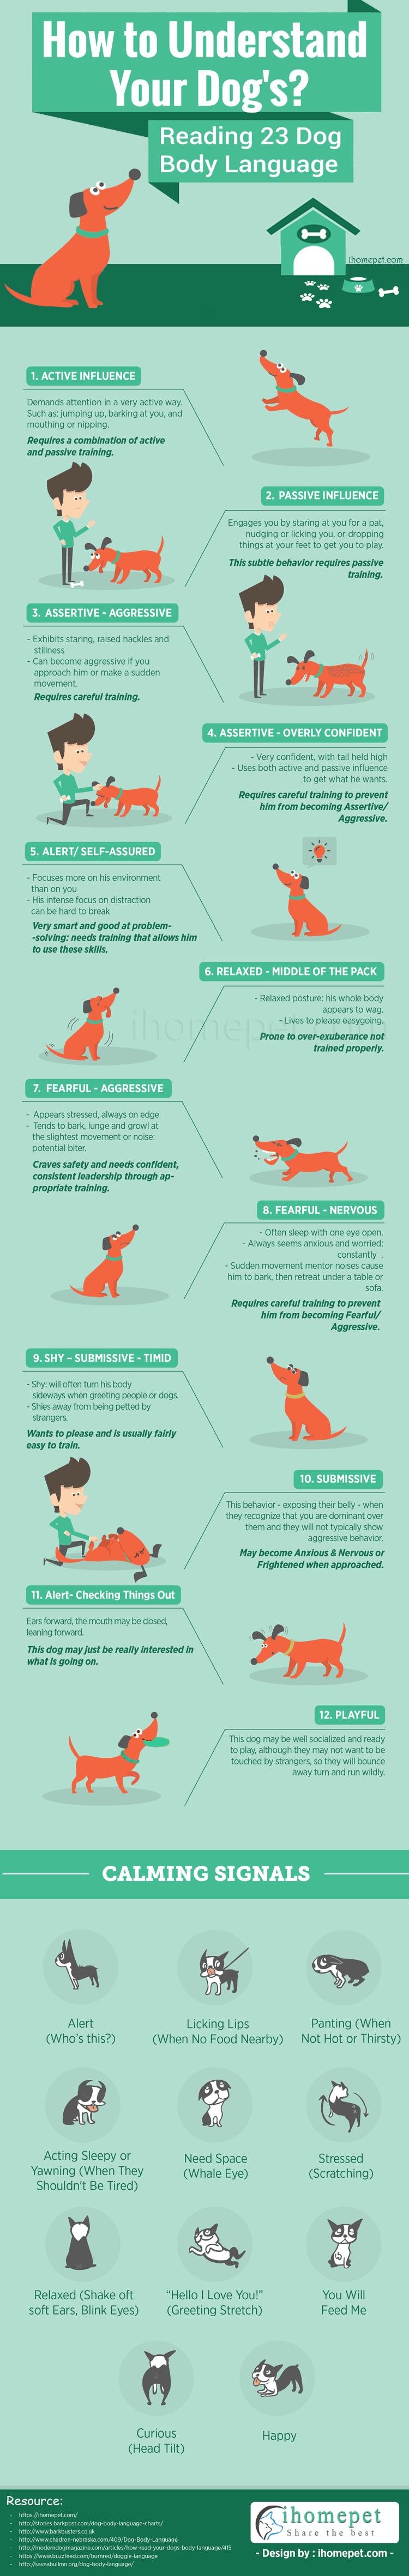 Understand Dog Body Language Infographic